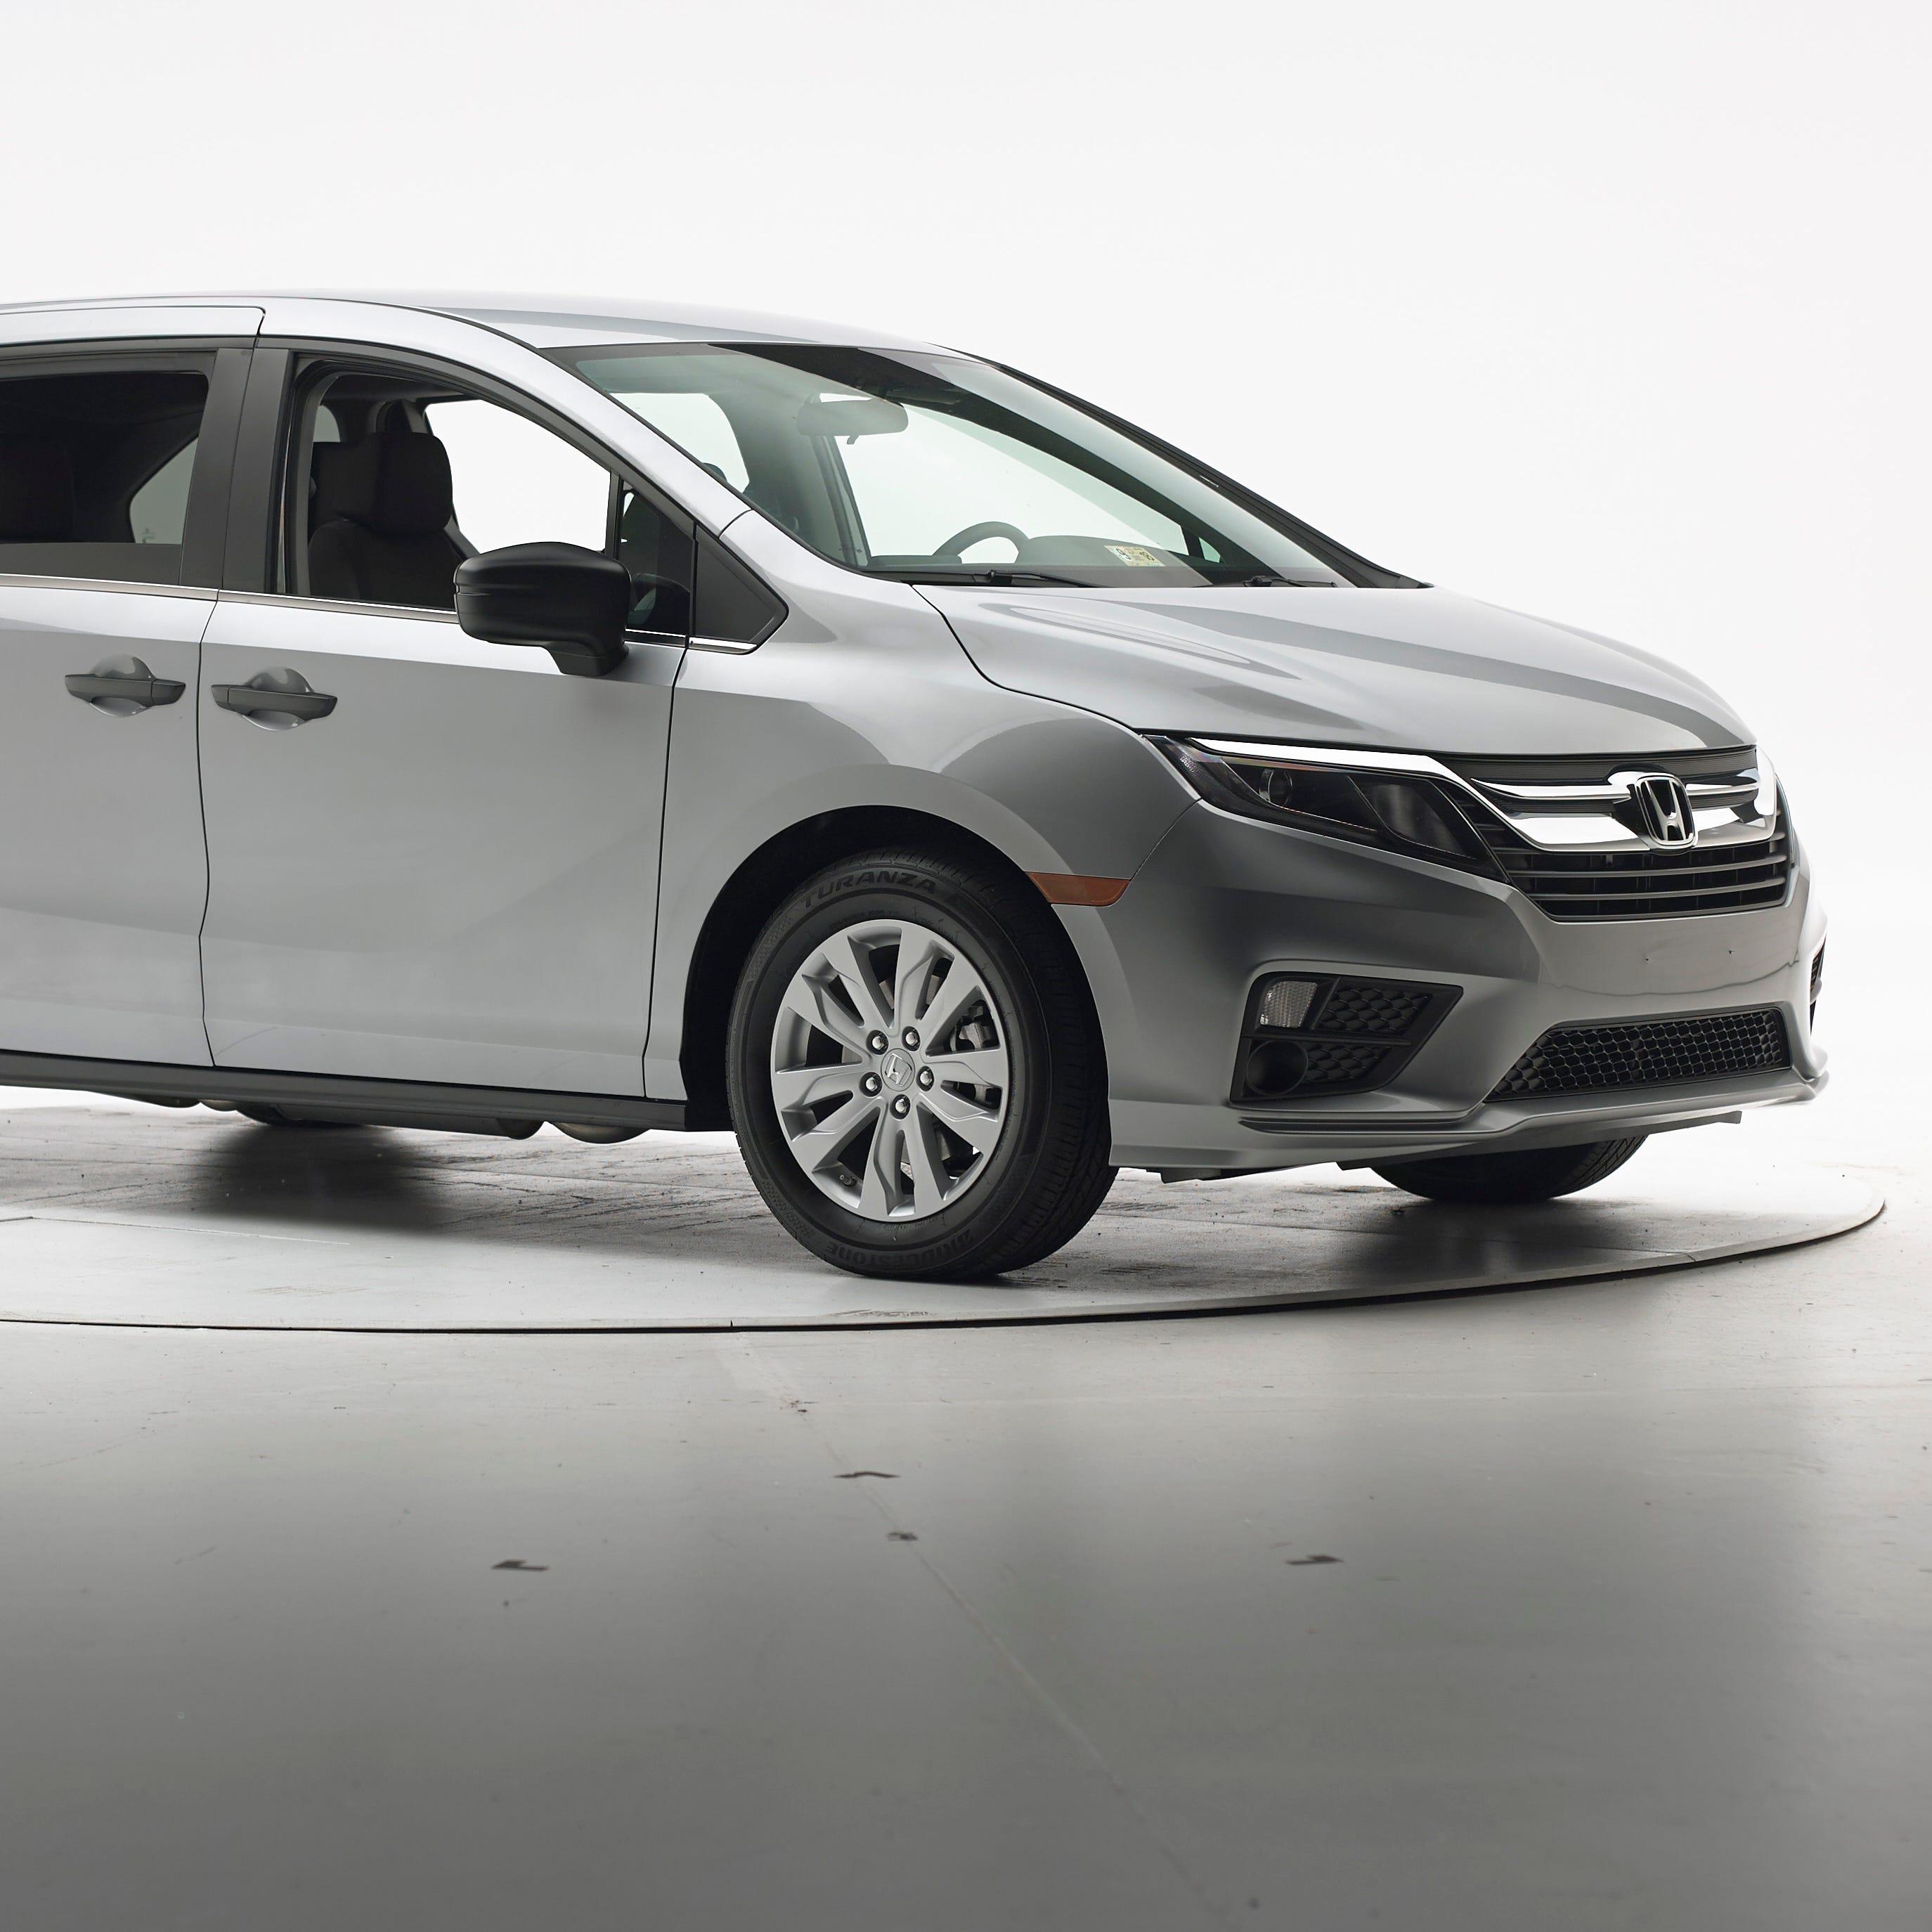 Honda Odyssey tops minivans in new crash test